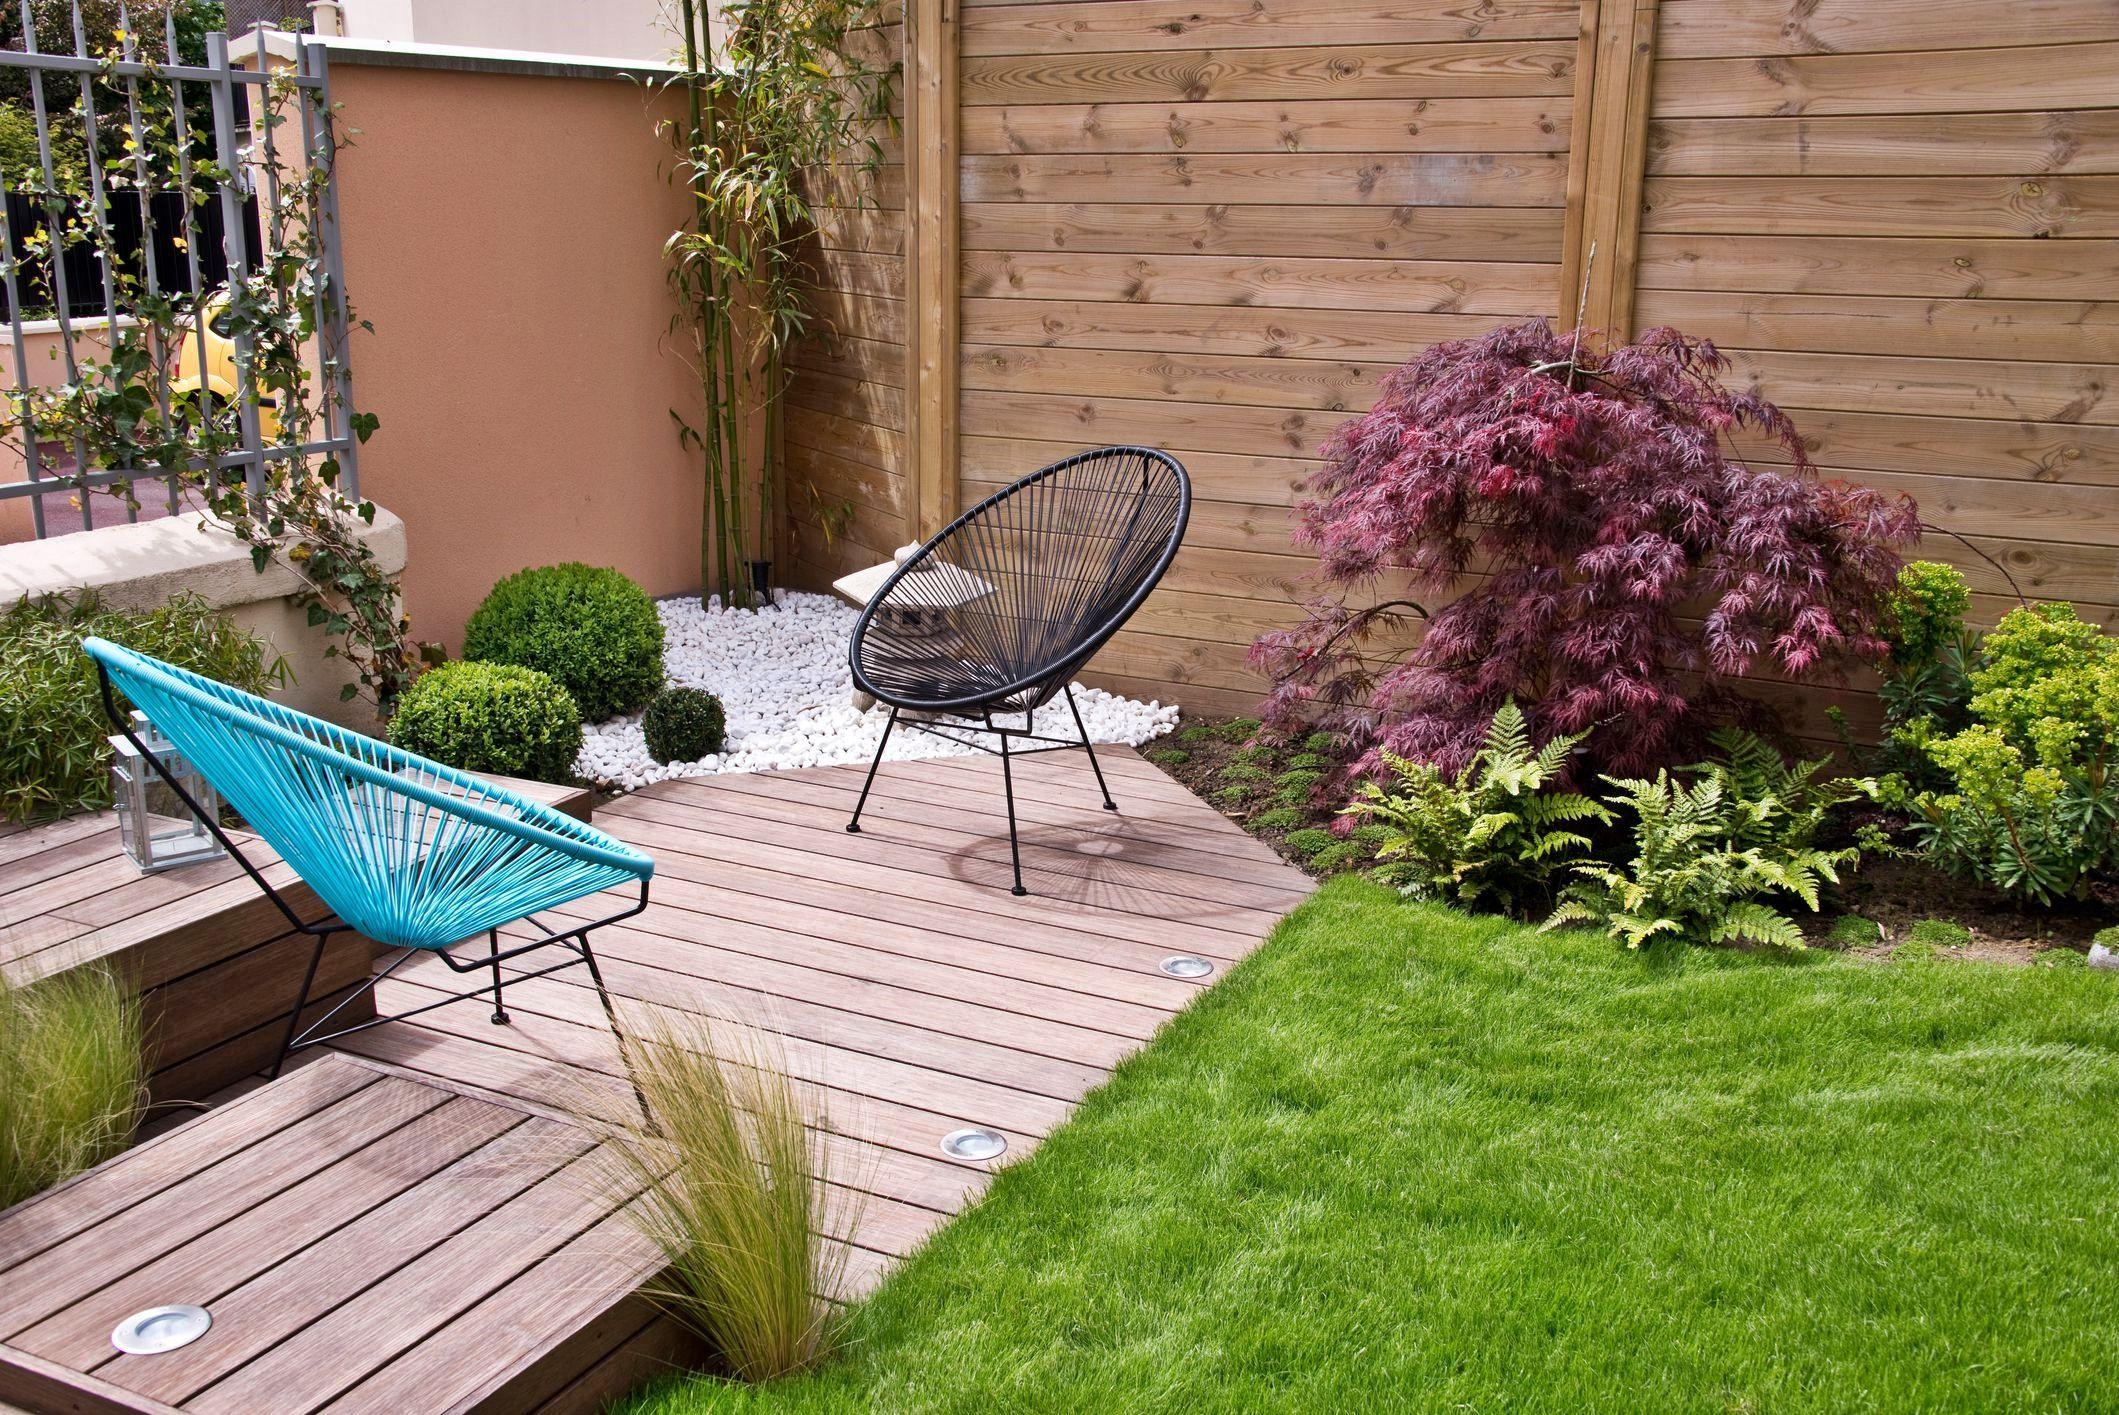 22 Perfect Garden Furniture Ideas to Enjoy Your Spring ...